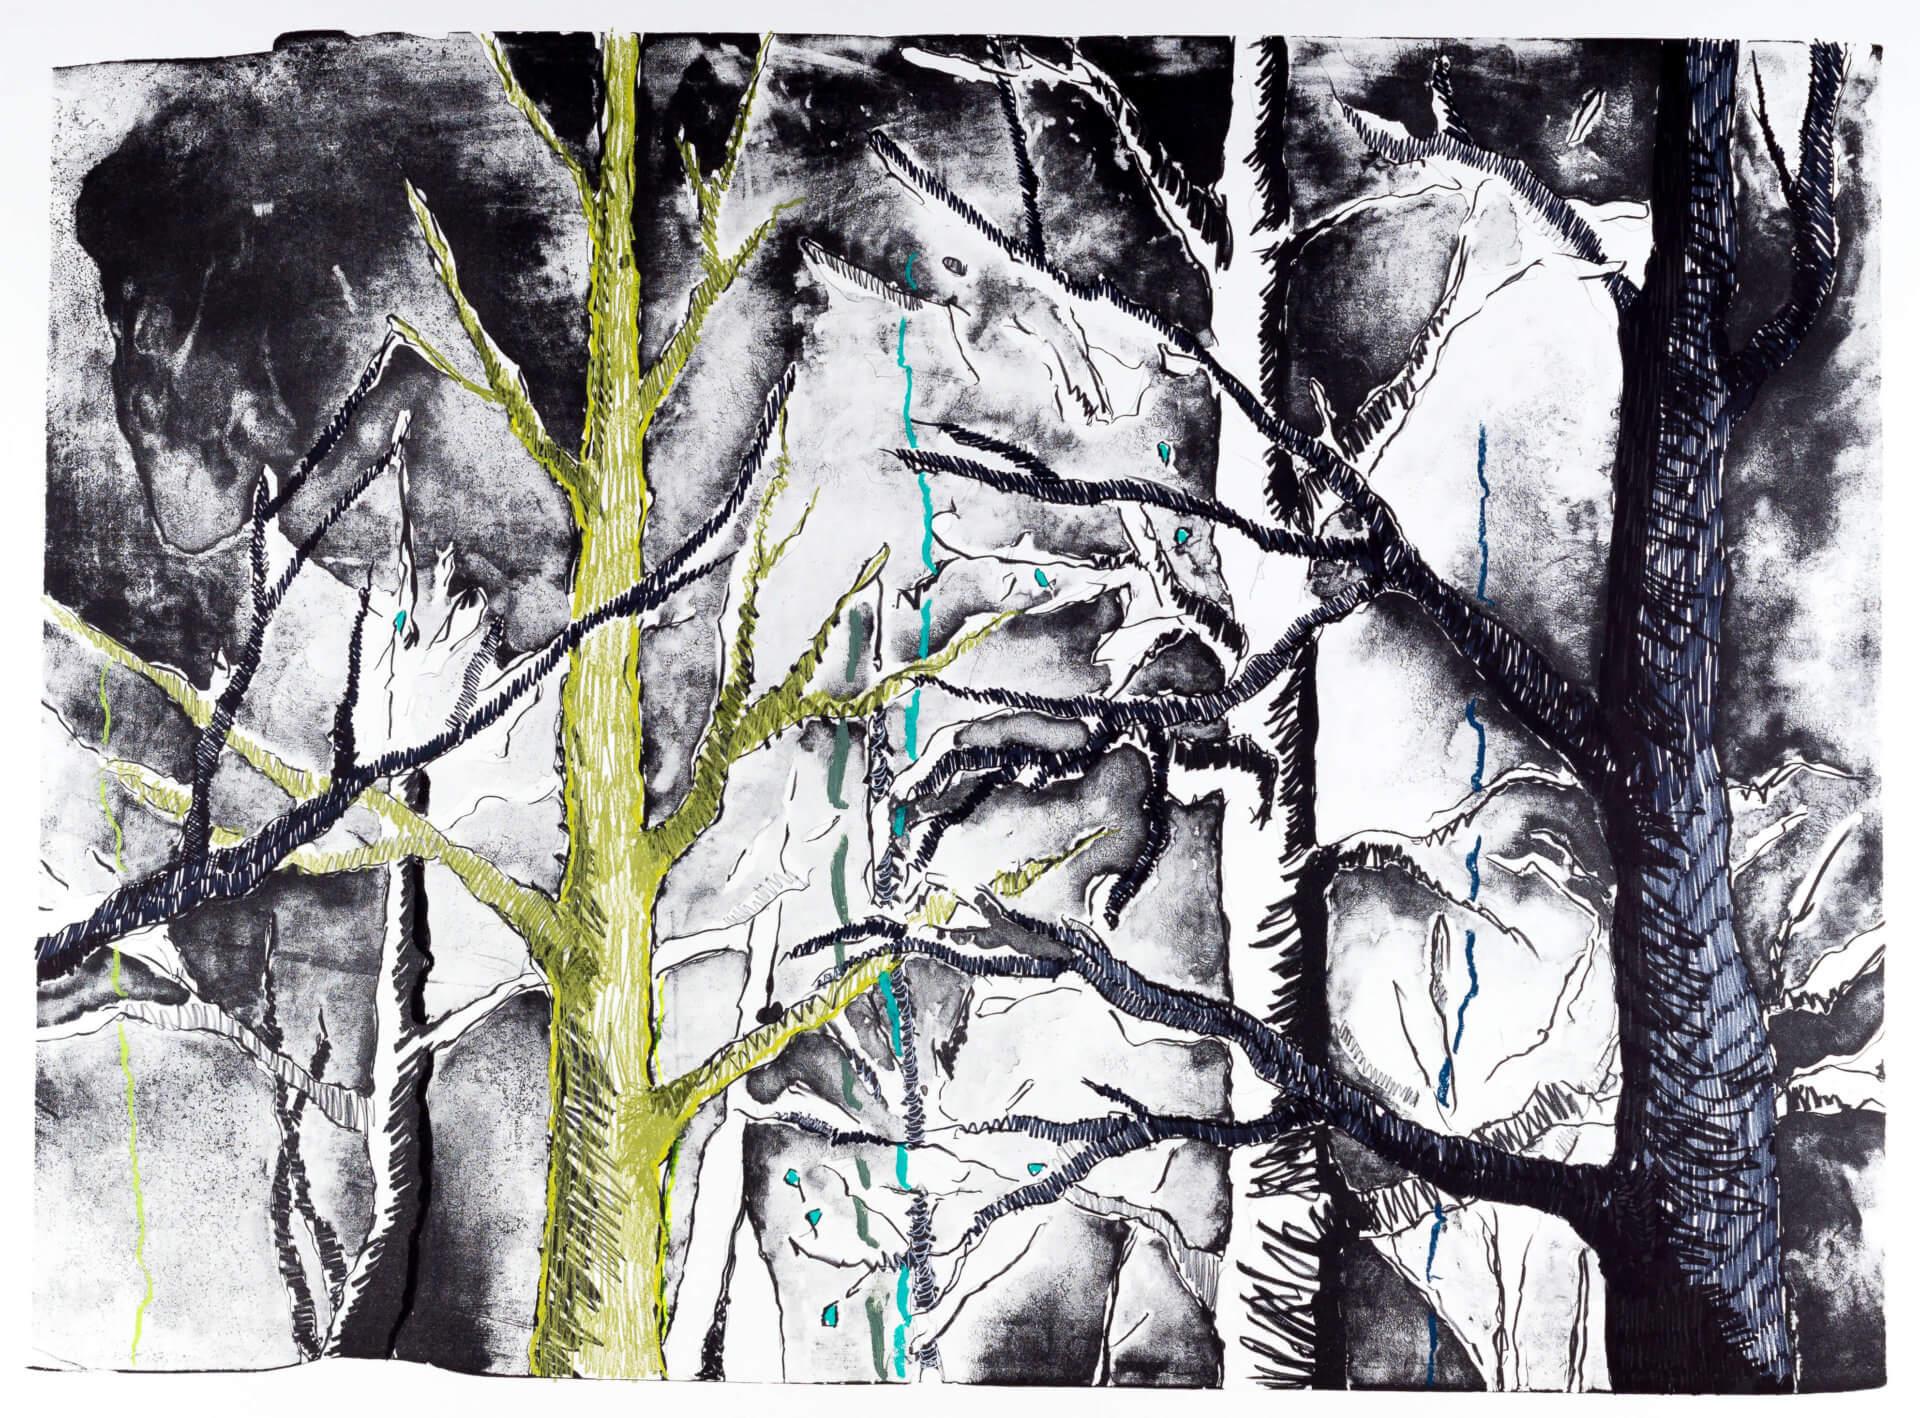 Katharina Albers, Wald (F_A)(F), 2015, Lithographie handkoloriert (Ölkreide, Graphit, Aquarellfarbe, Fineliner), Unikat, 70×100 cm